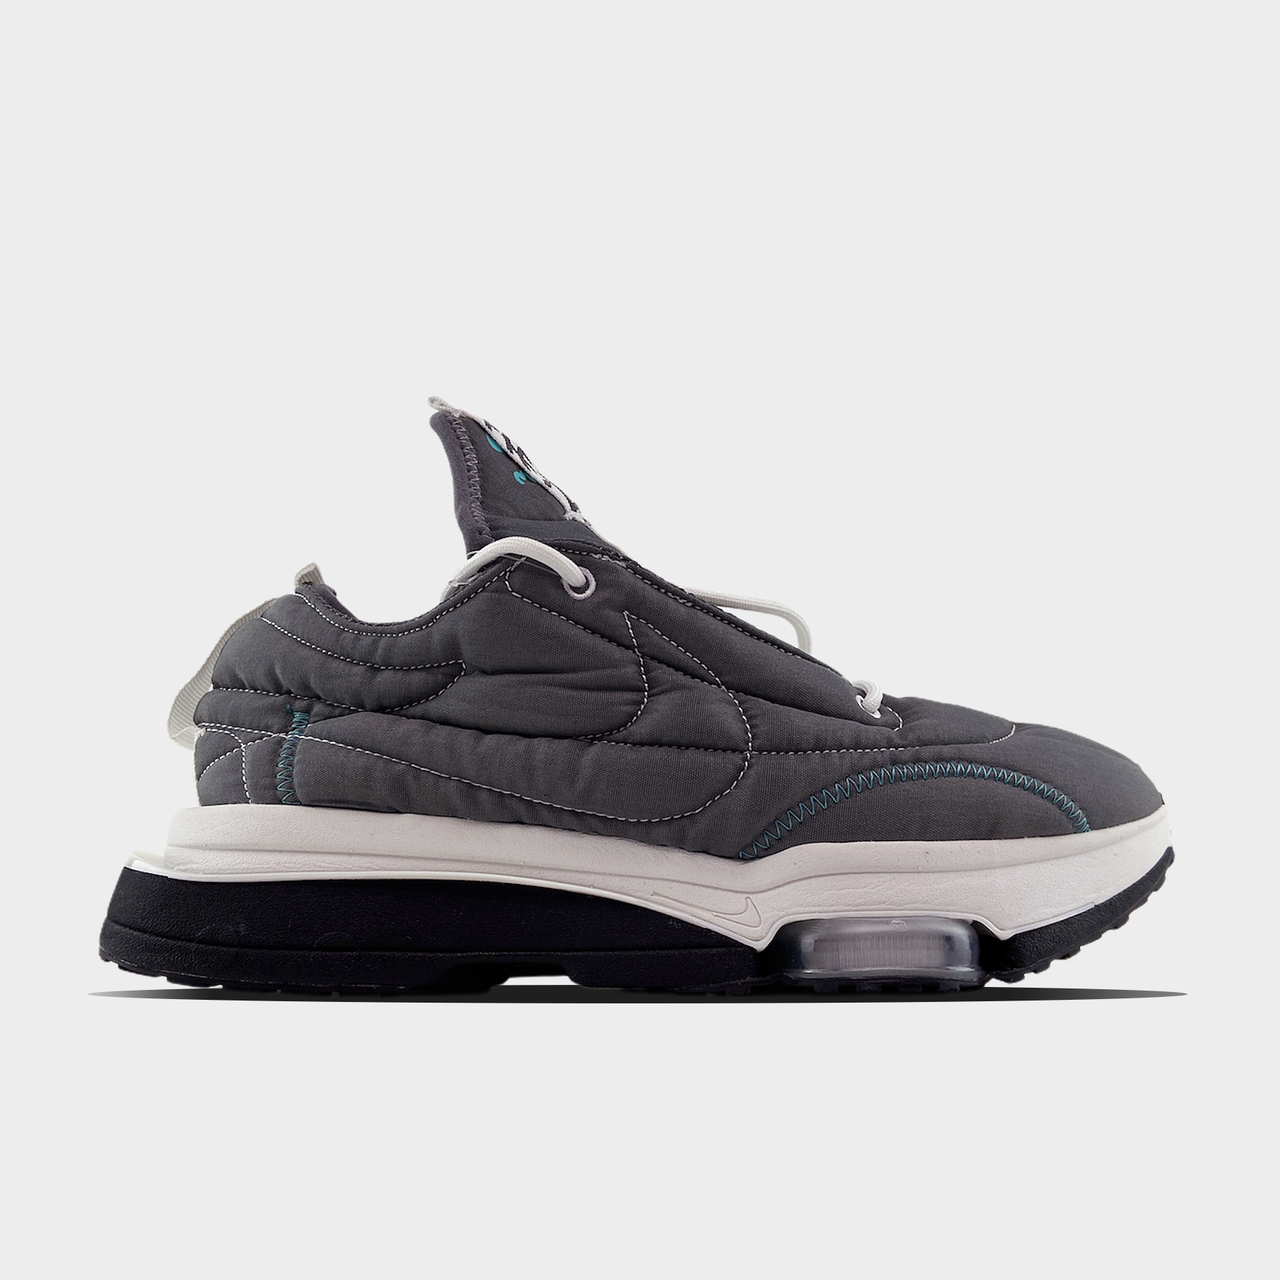 MACCIU x Nk, крос, обувь, взуття, sneakers, шузы, Air Zoom Type Grey (Серый)